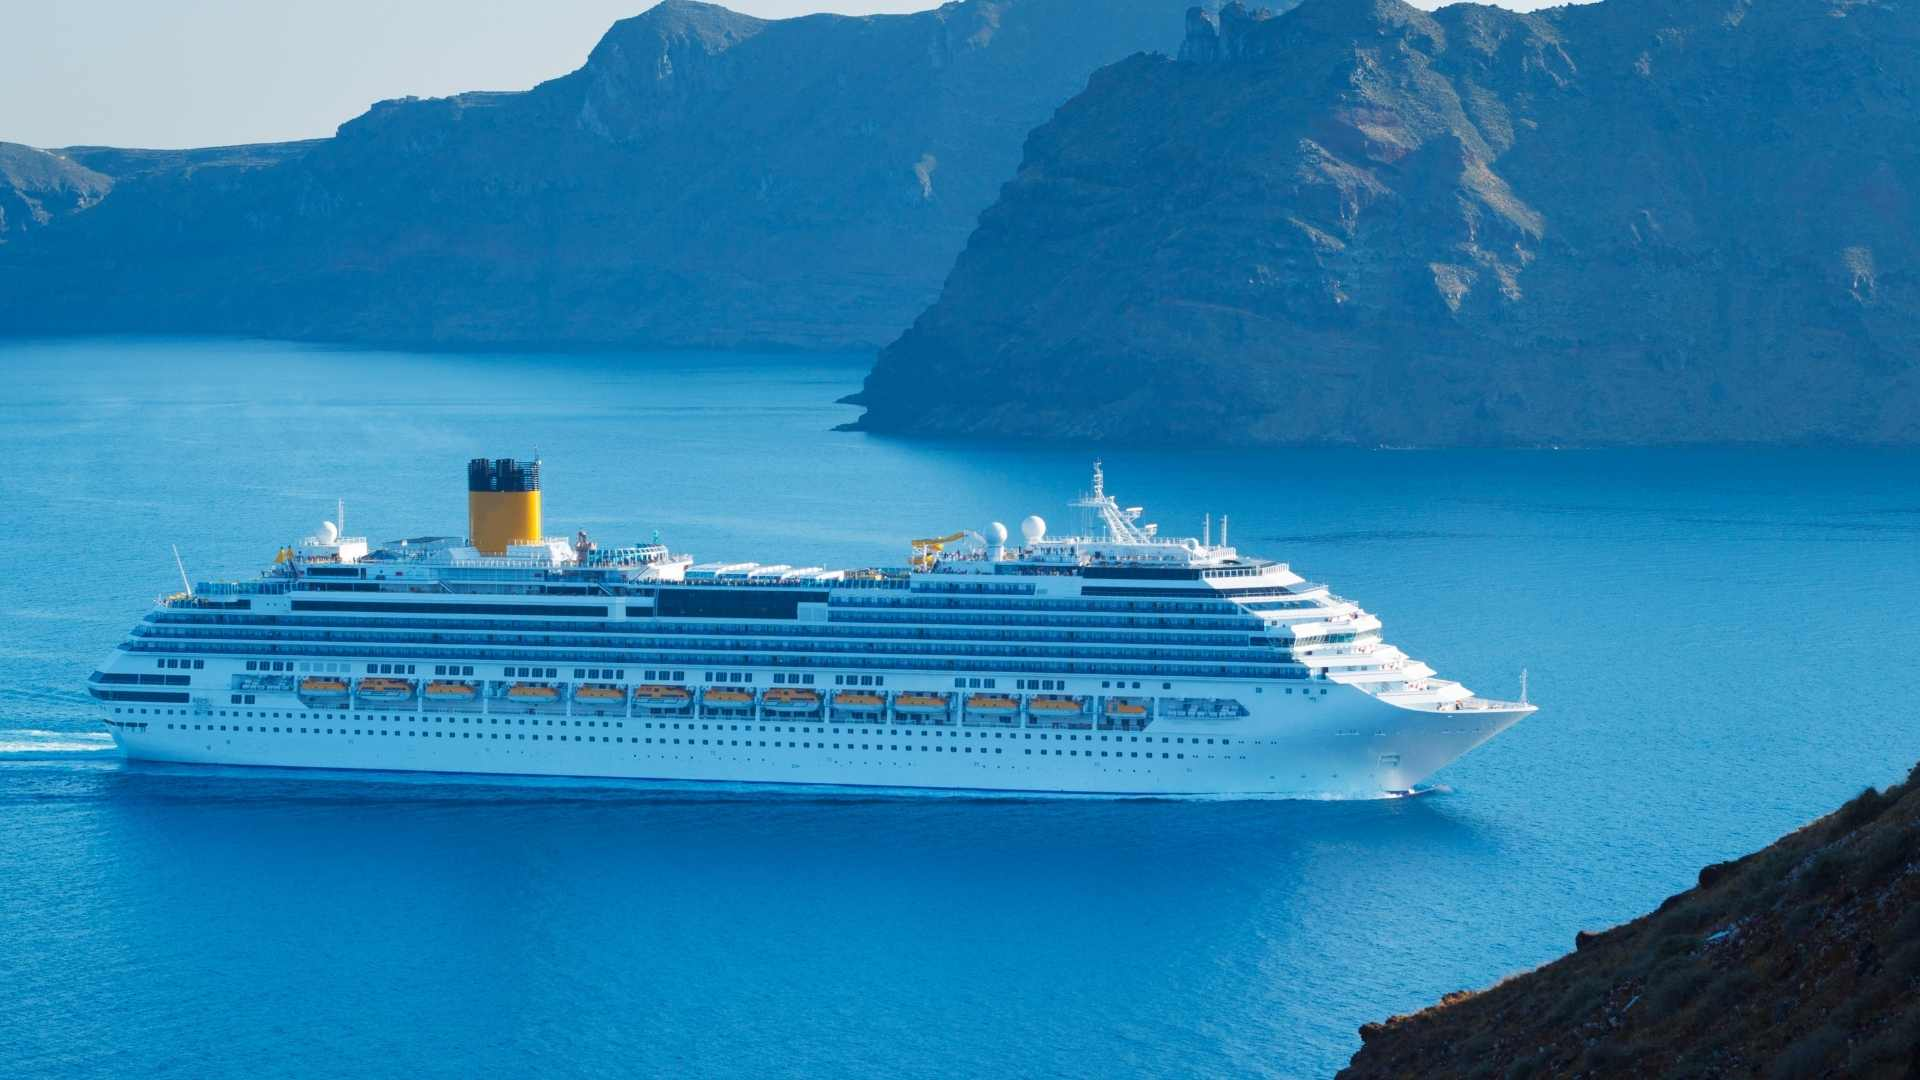 Alaskan cruises